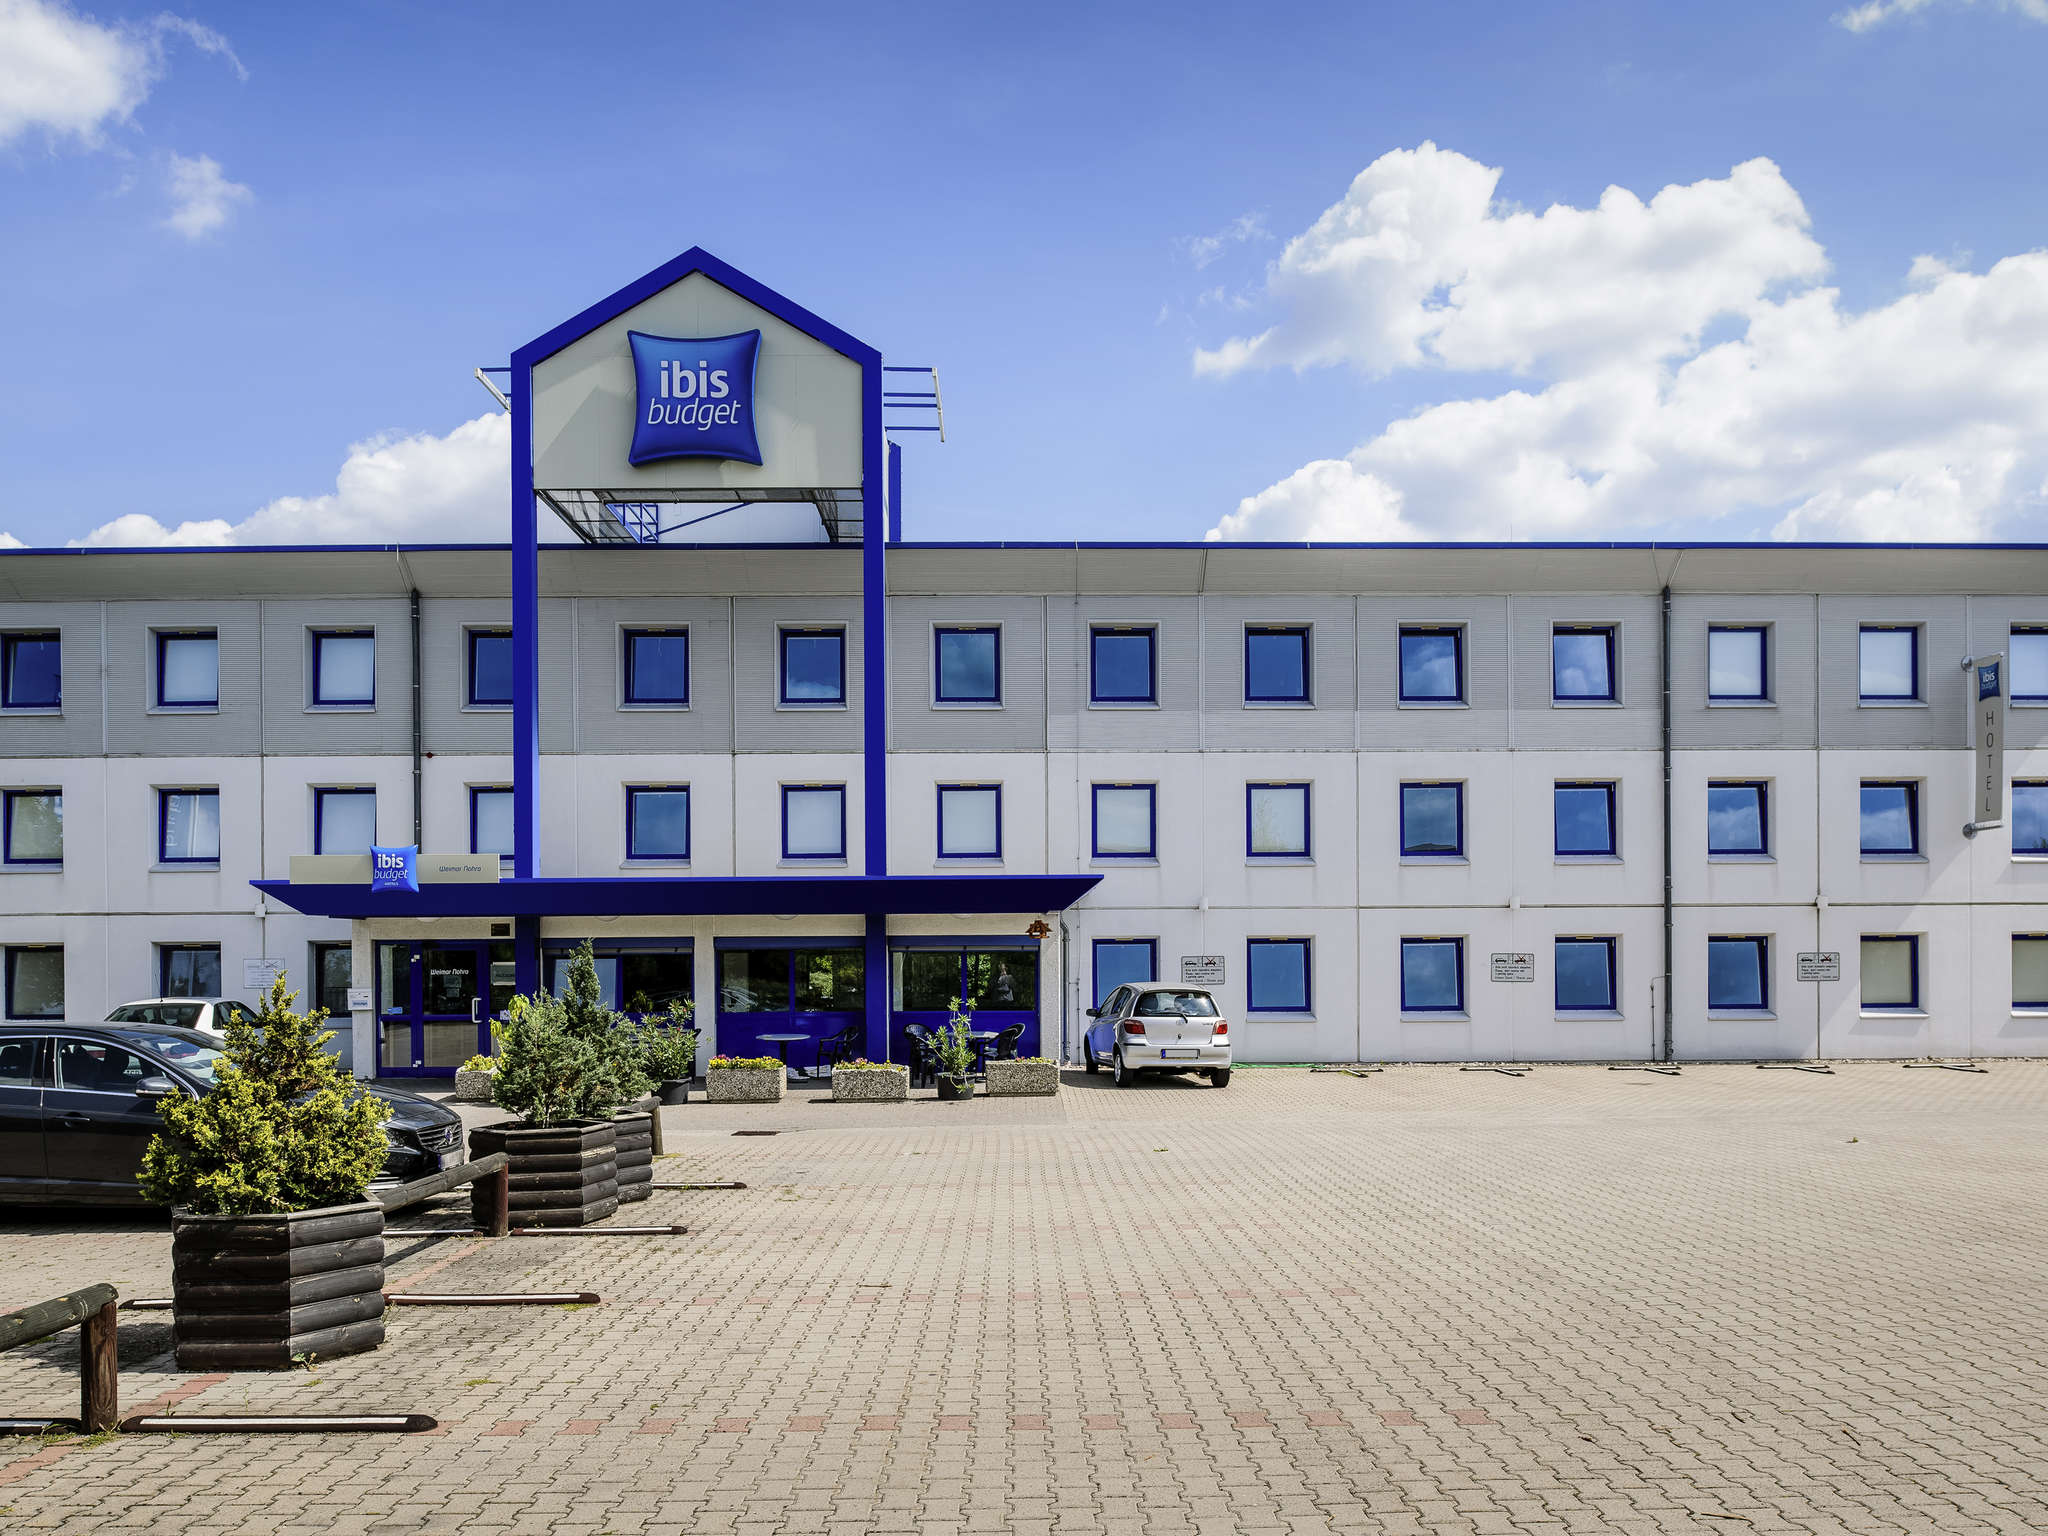 Hotel Ibis Budget Weimar Nohra Book Online Now Free Wifi